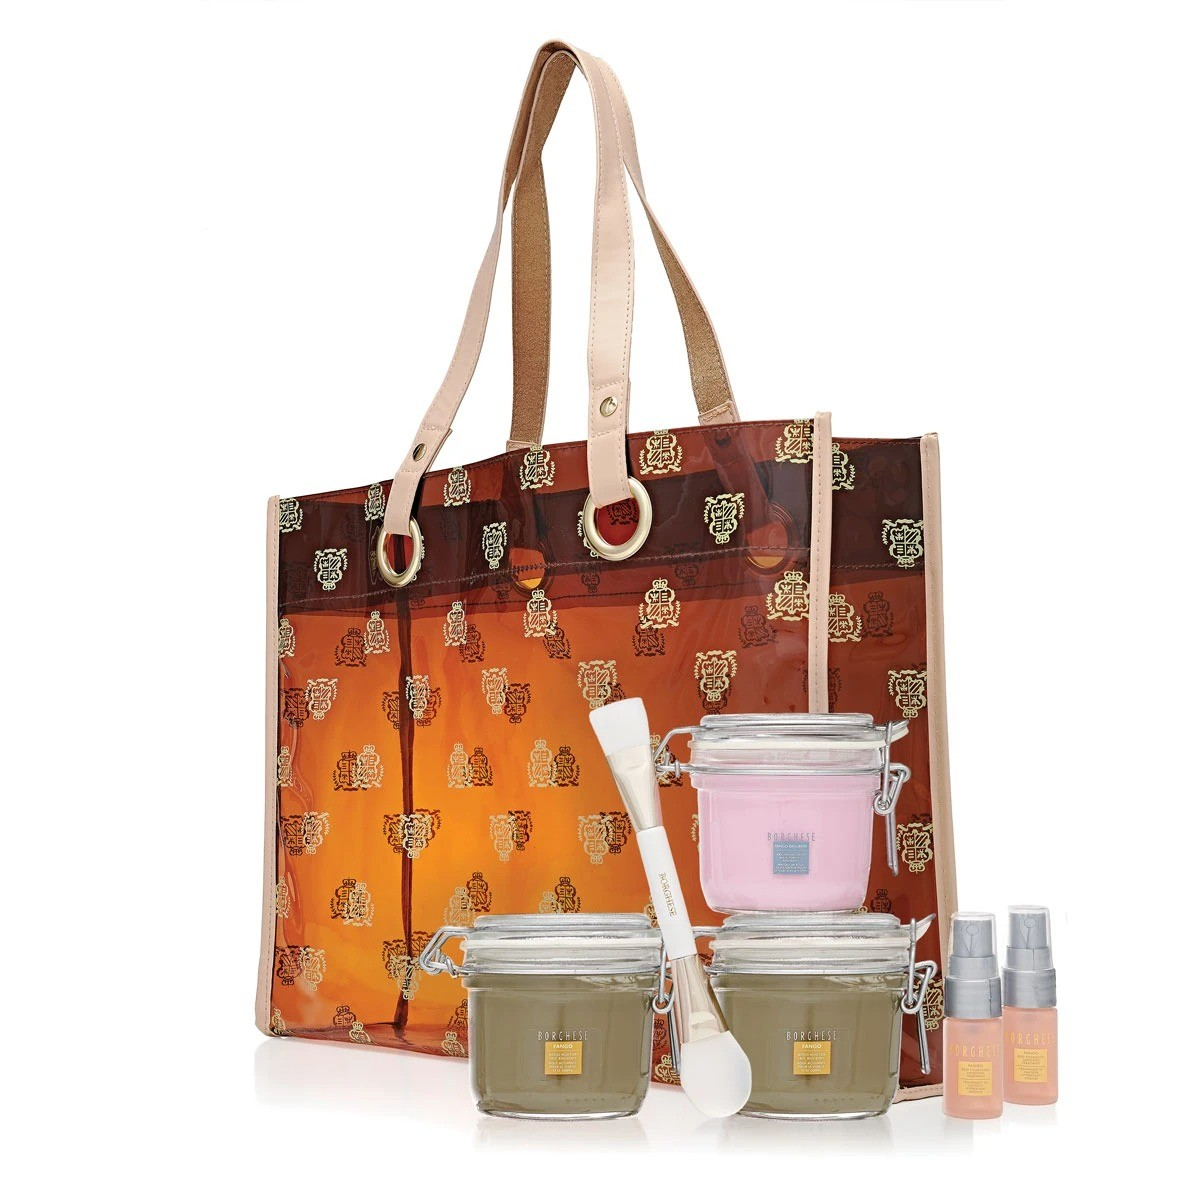 Borghese Mask, Hydration & Logo Tote Bag Set